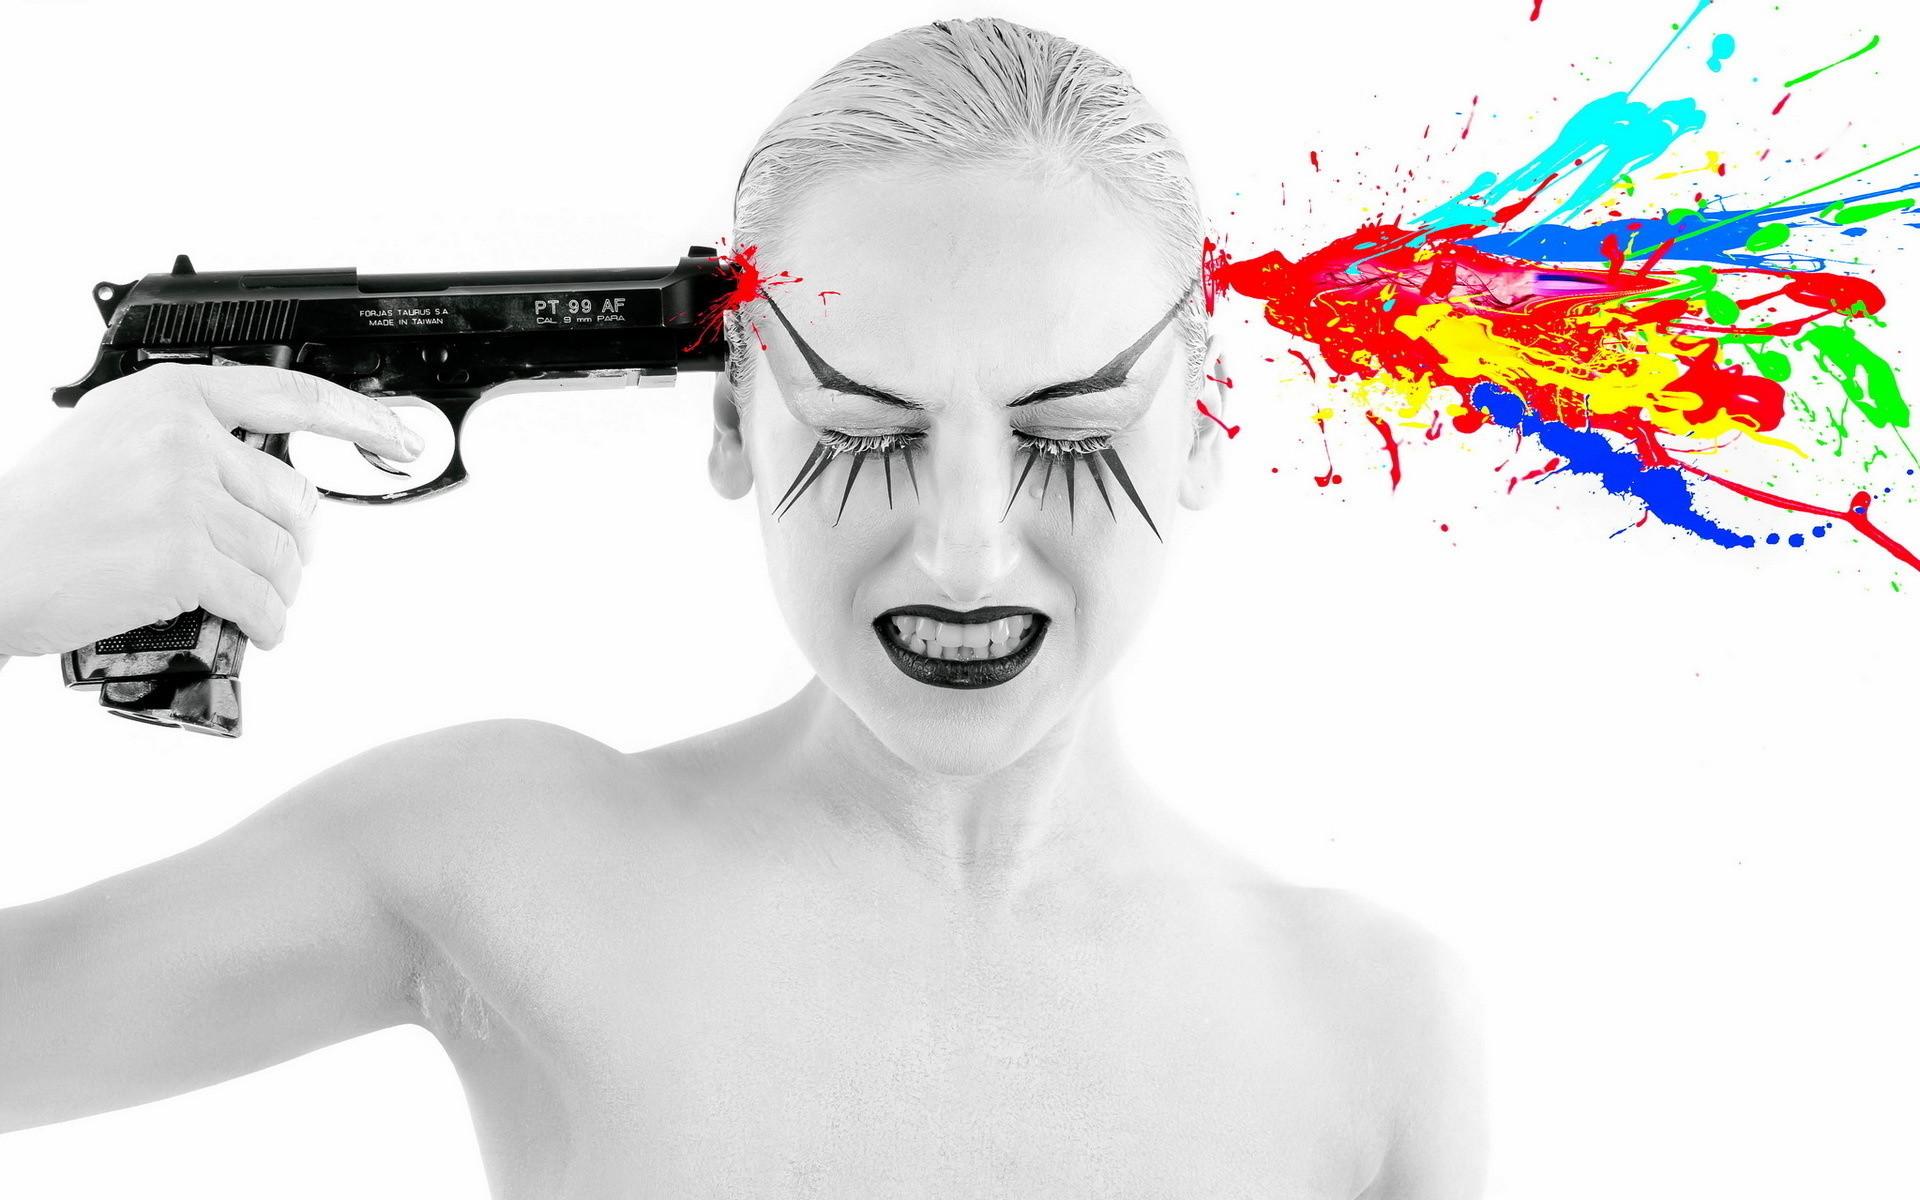 Girls And Guns Girl Gun Psychedelic Weapon Gun Mood Suicide Wallpaper At  Dark Wallpapers